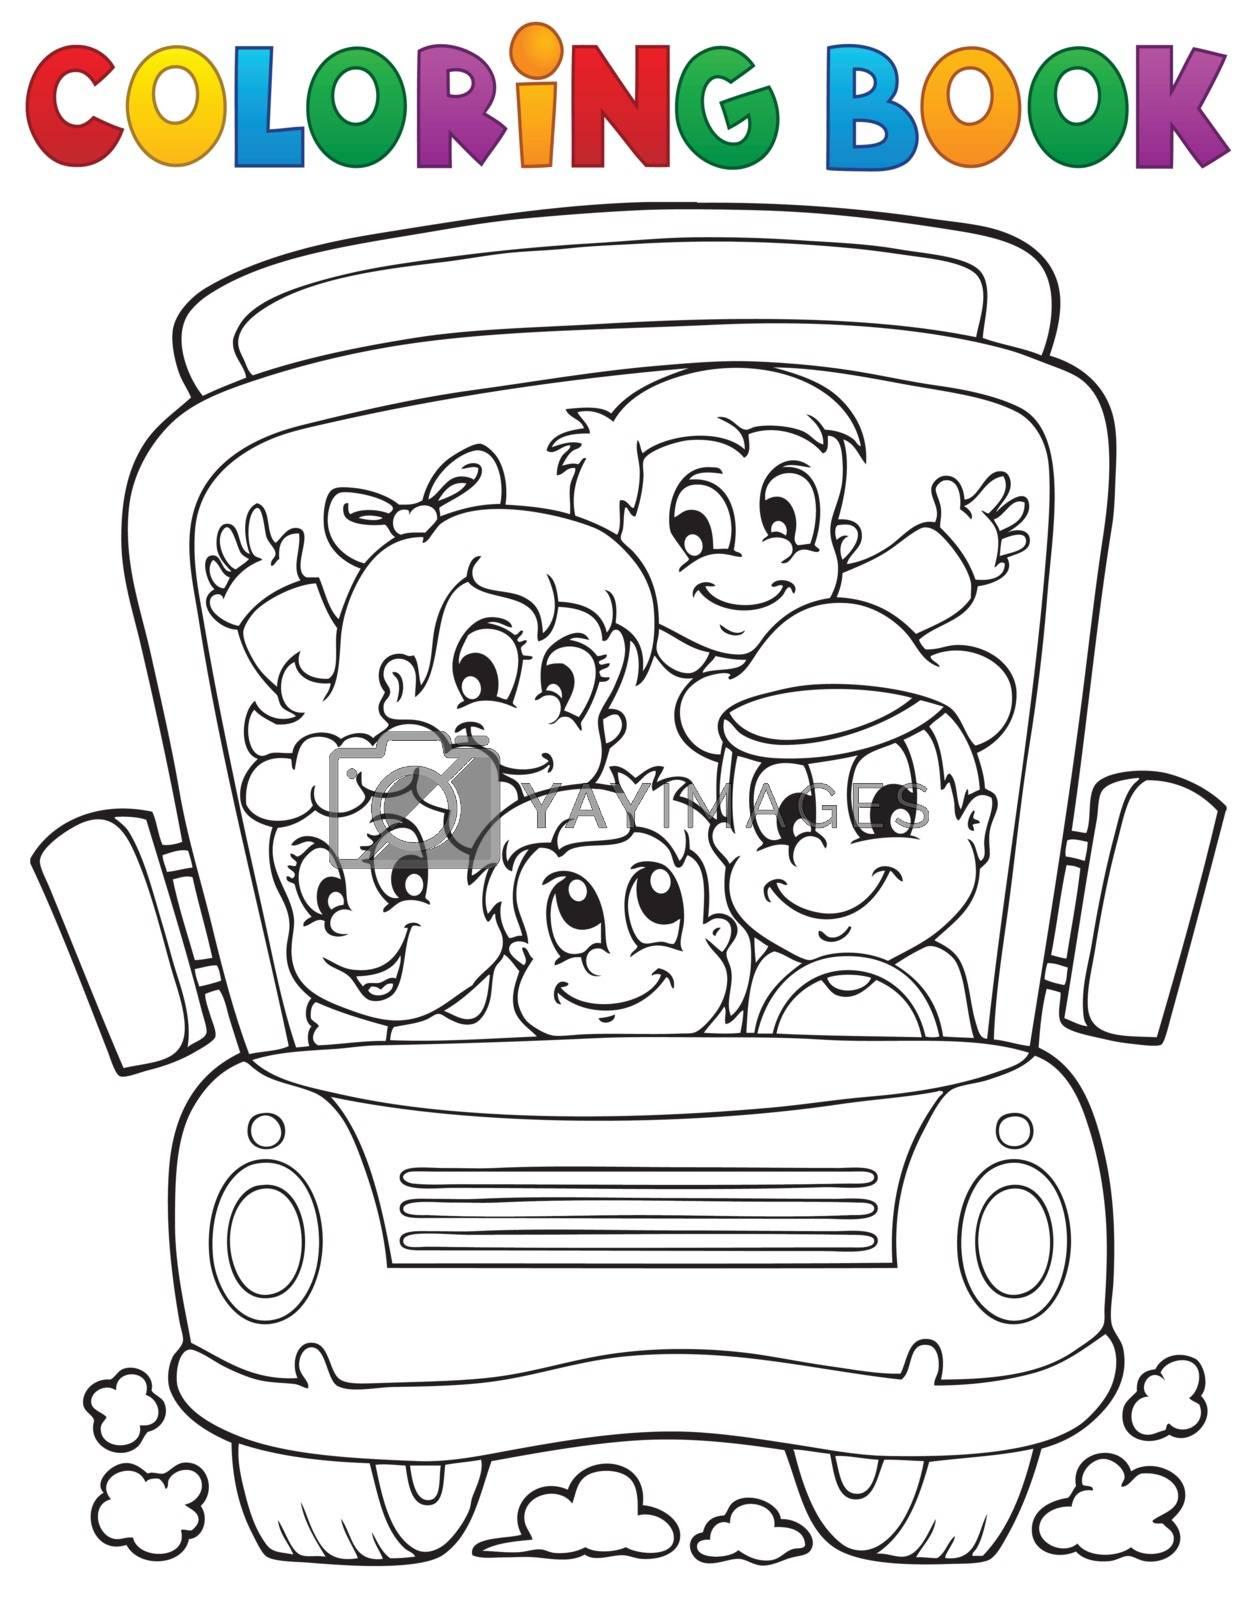 Coloring book school bus theme 1 - eps10 vector illustration.